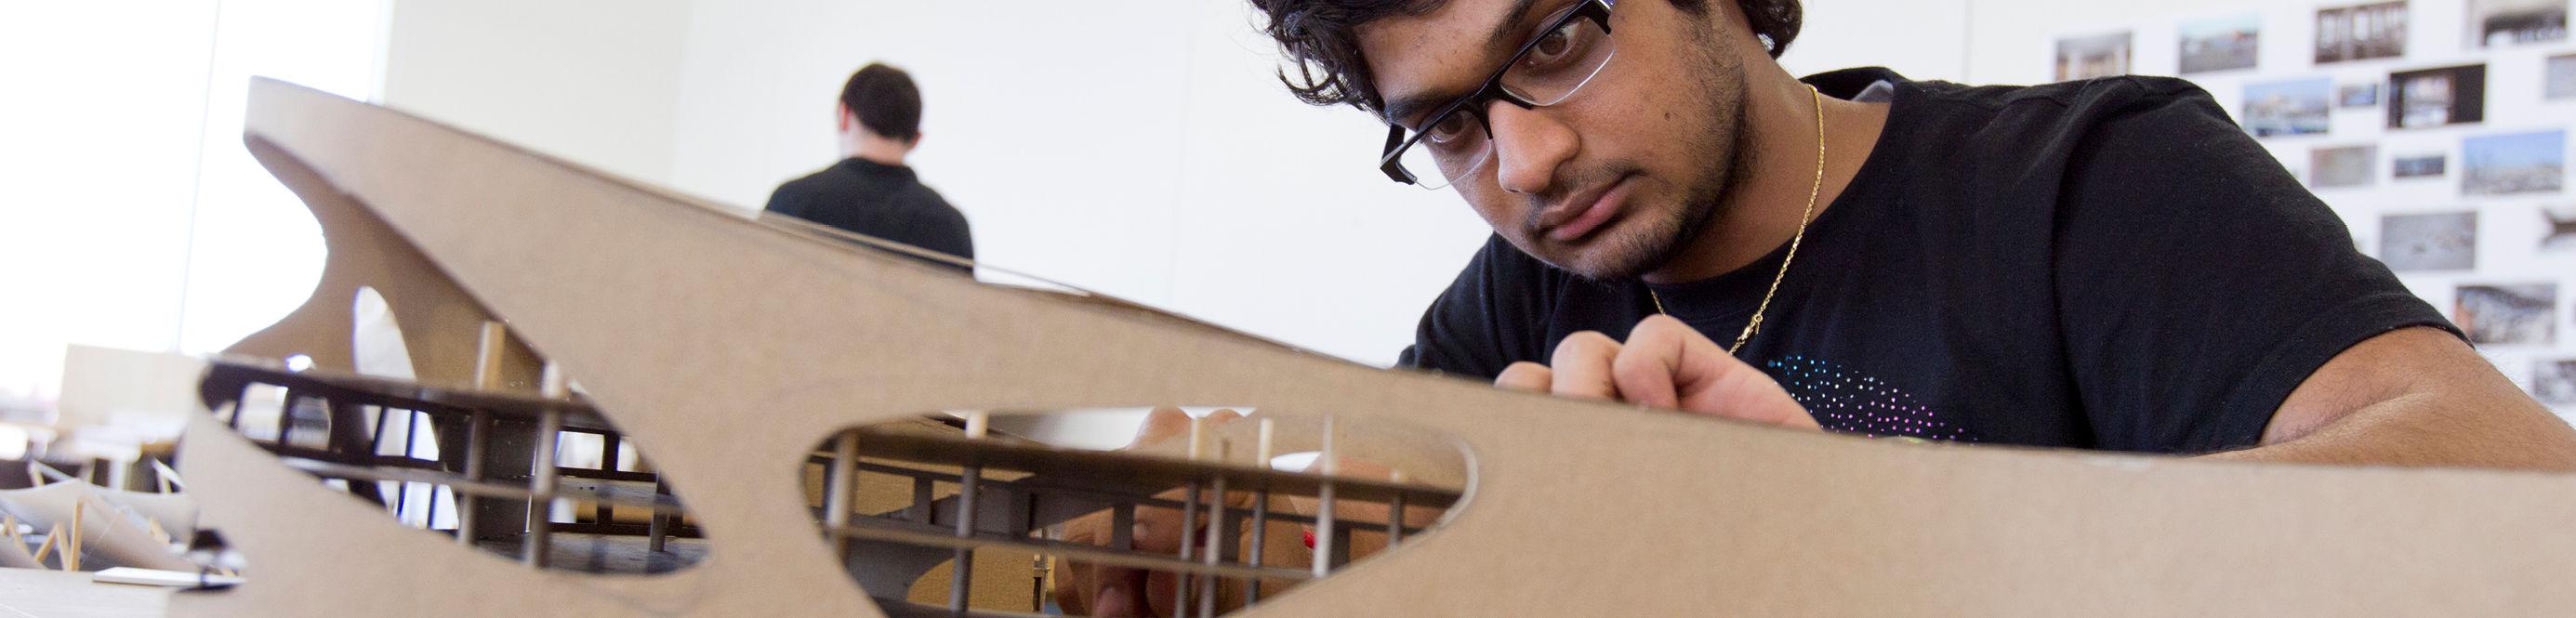 student building model